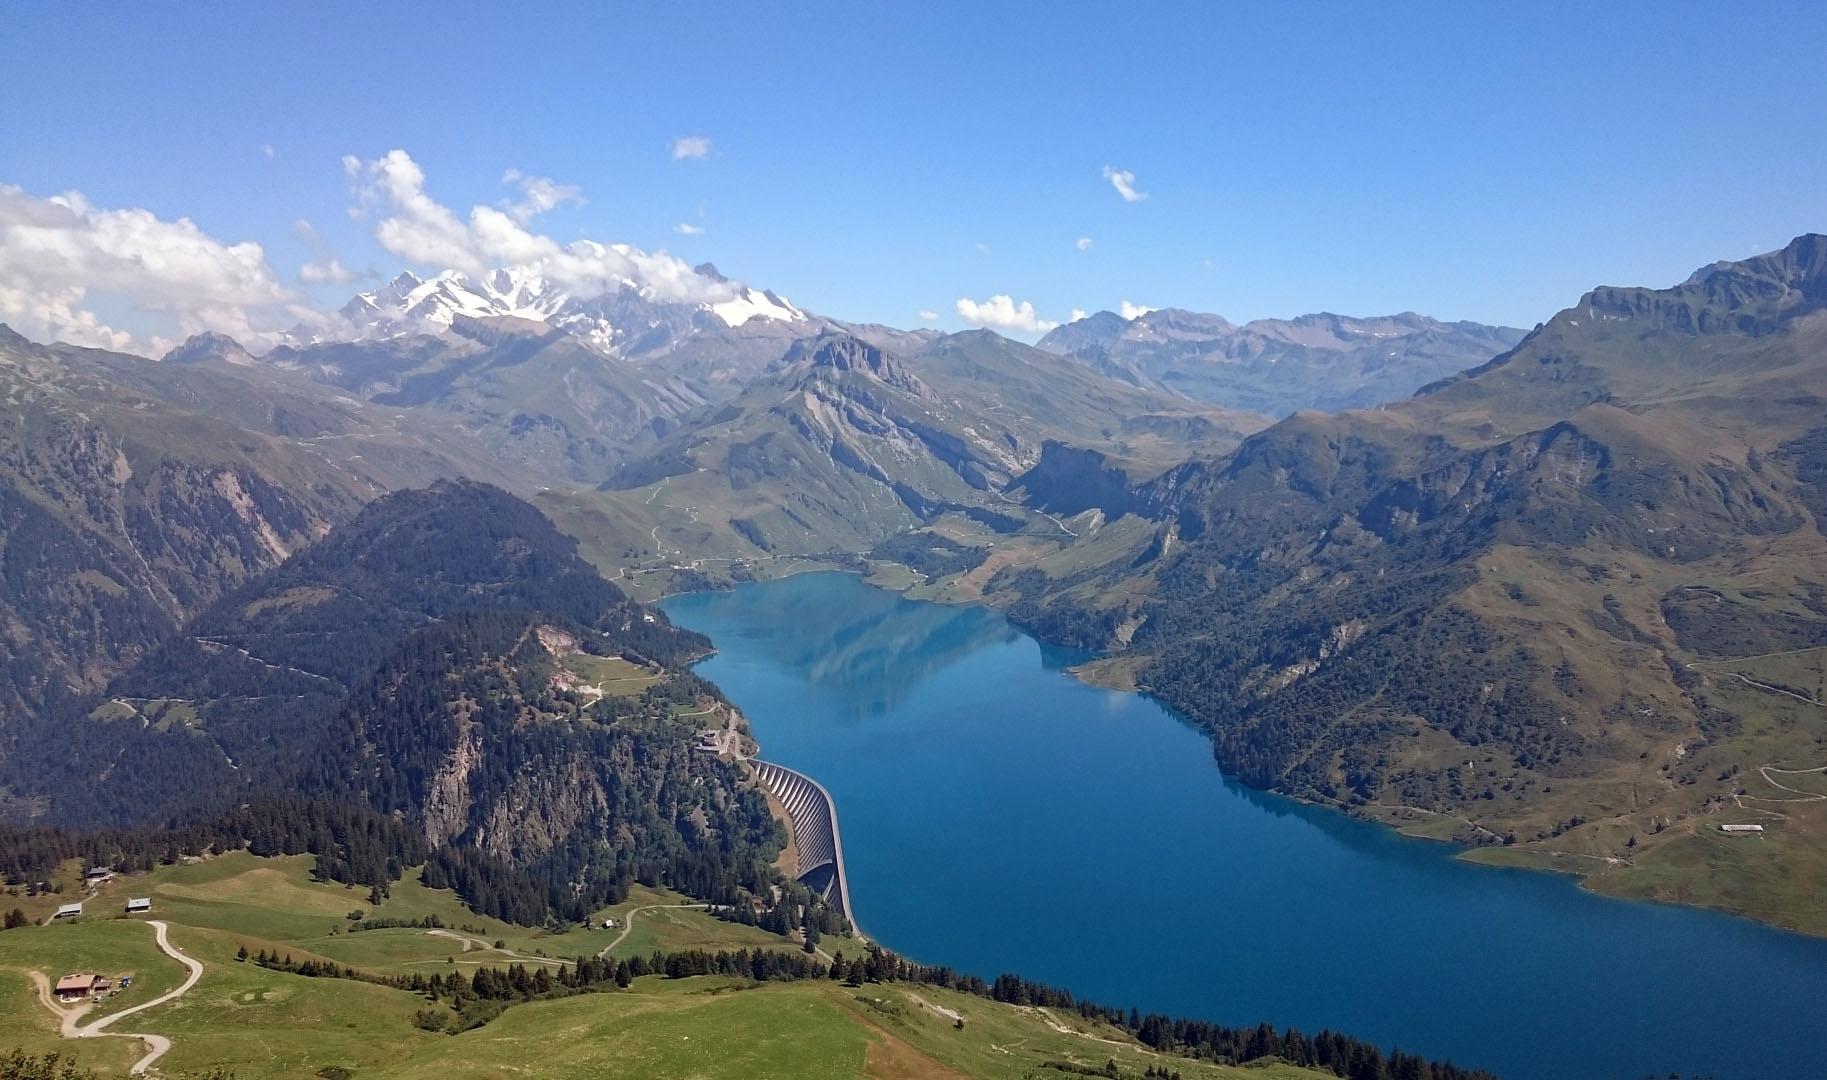 Lac de Roselend & Pierra Menta